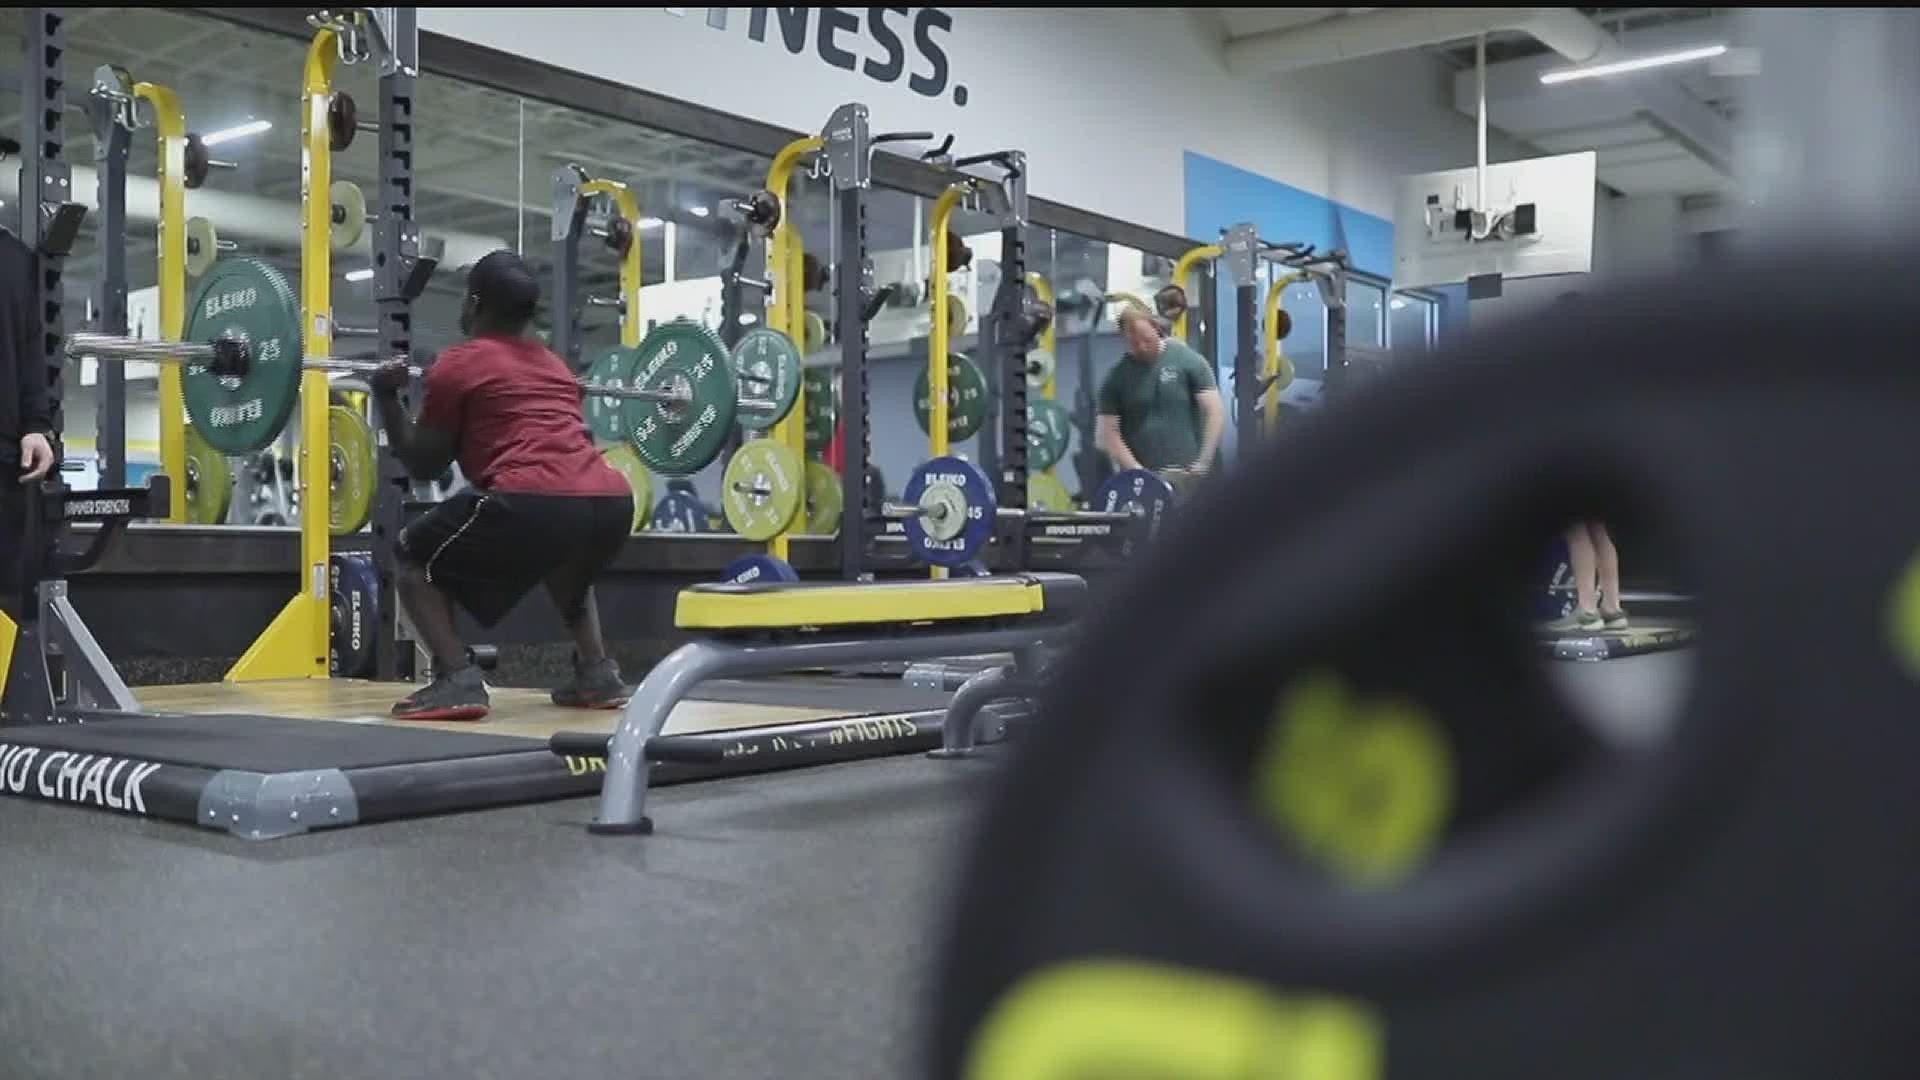 Cancel A Gym Membership For Free During Covid 19 Fox43 Com